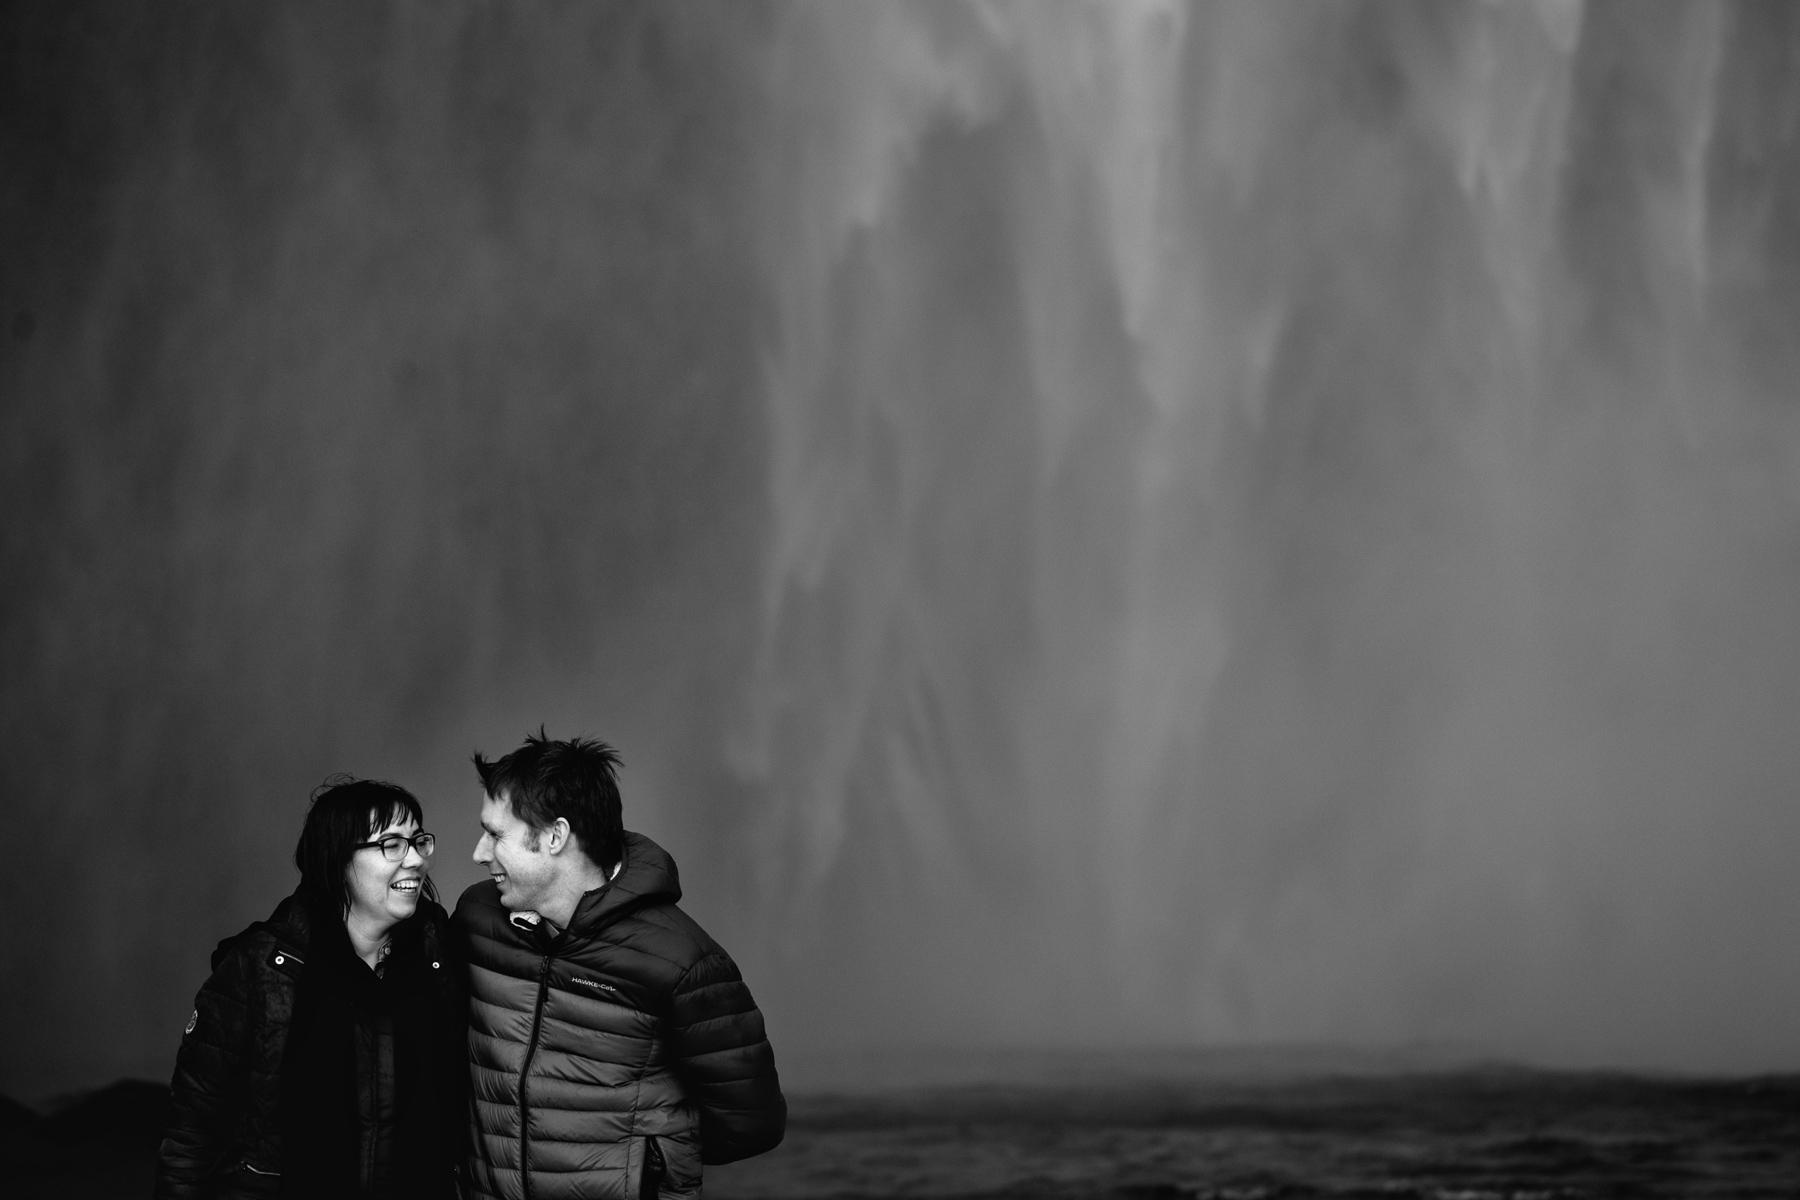 040-epic-iceland-photographer-portraits-kandisebrown-2016